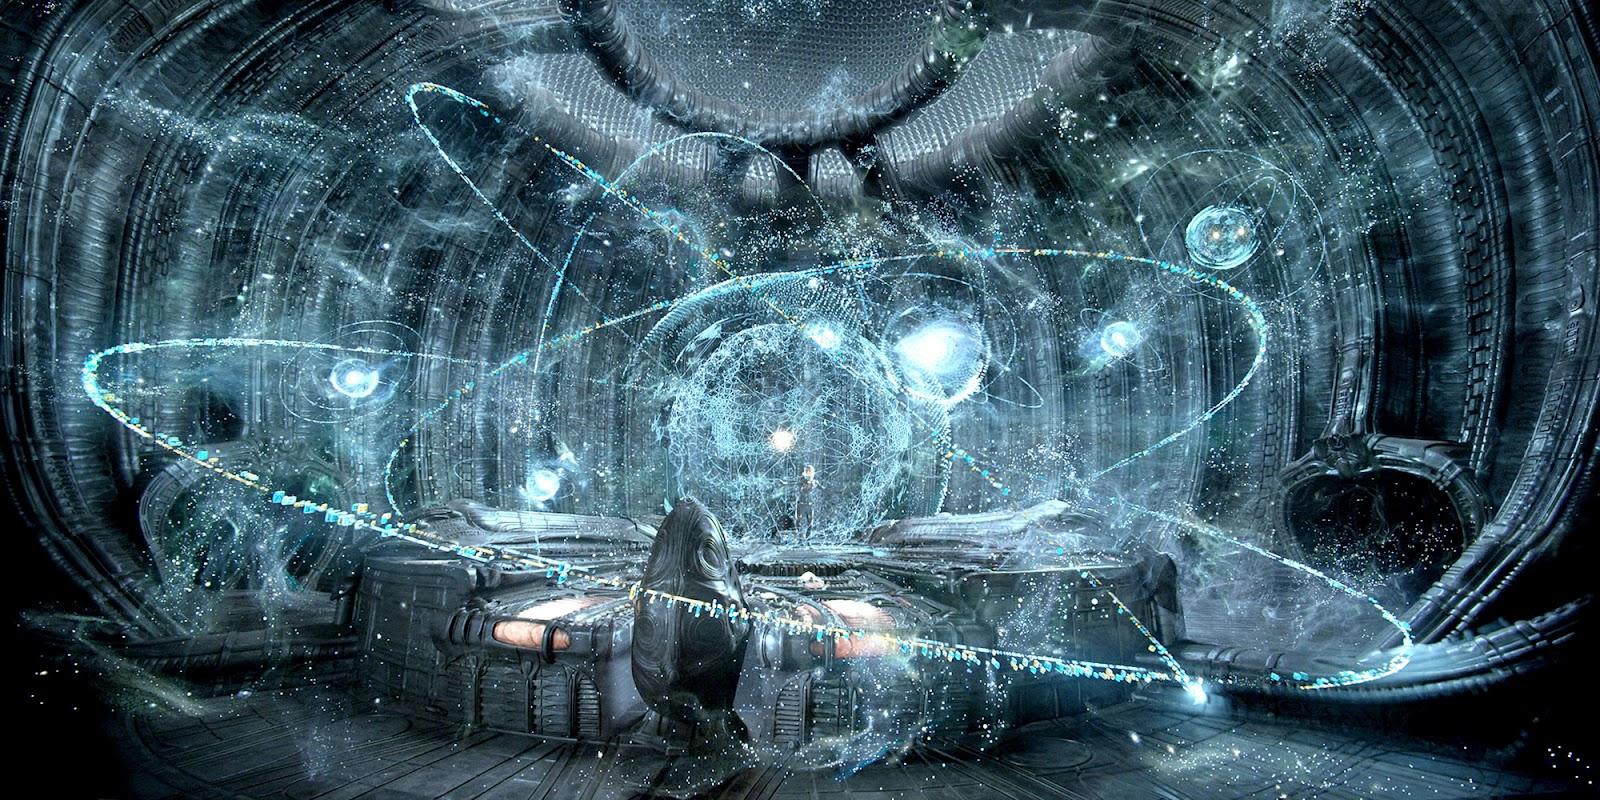 http://2.bp.blogspot.com/-7bUSEy1VYUQ/T9OMt3sV_HI/AAAAAAAAABc/Uxh18a6rxlI/s1600/Prometheus_hologram.jpg